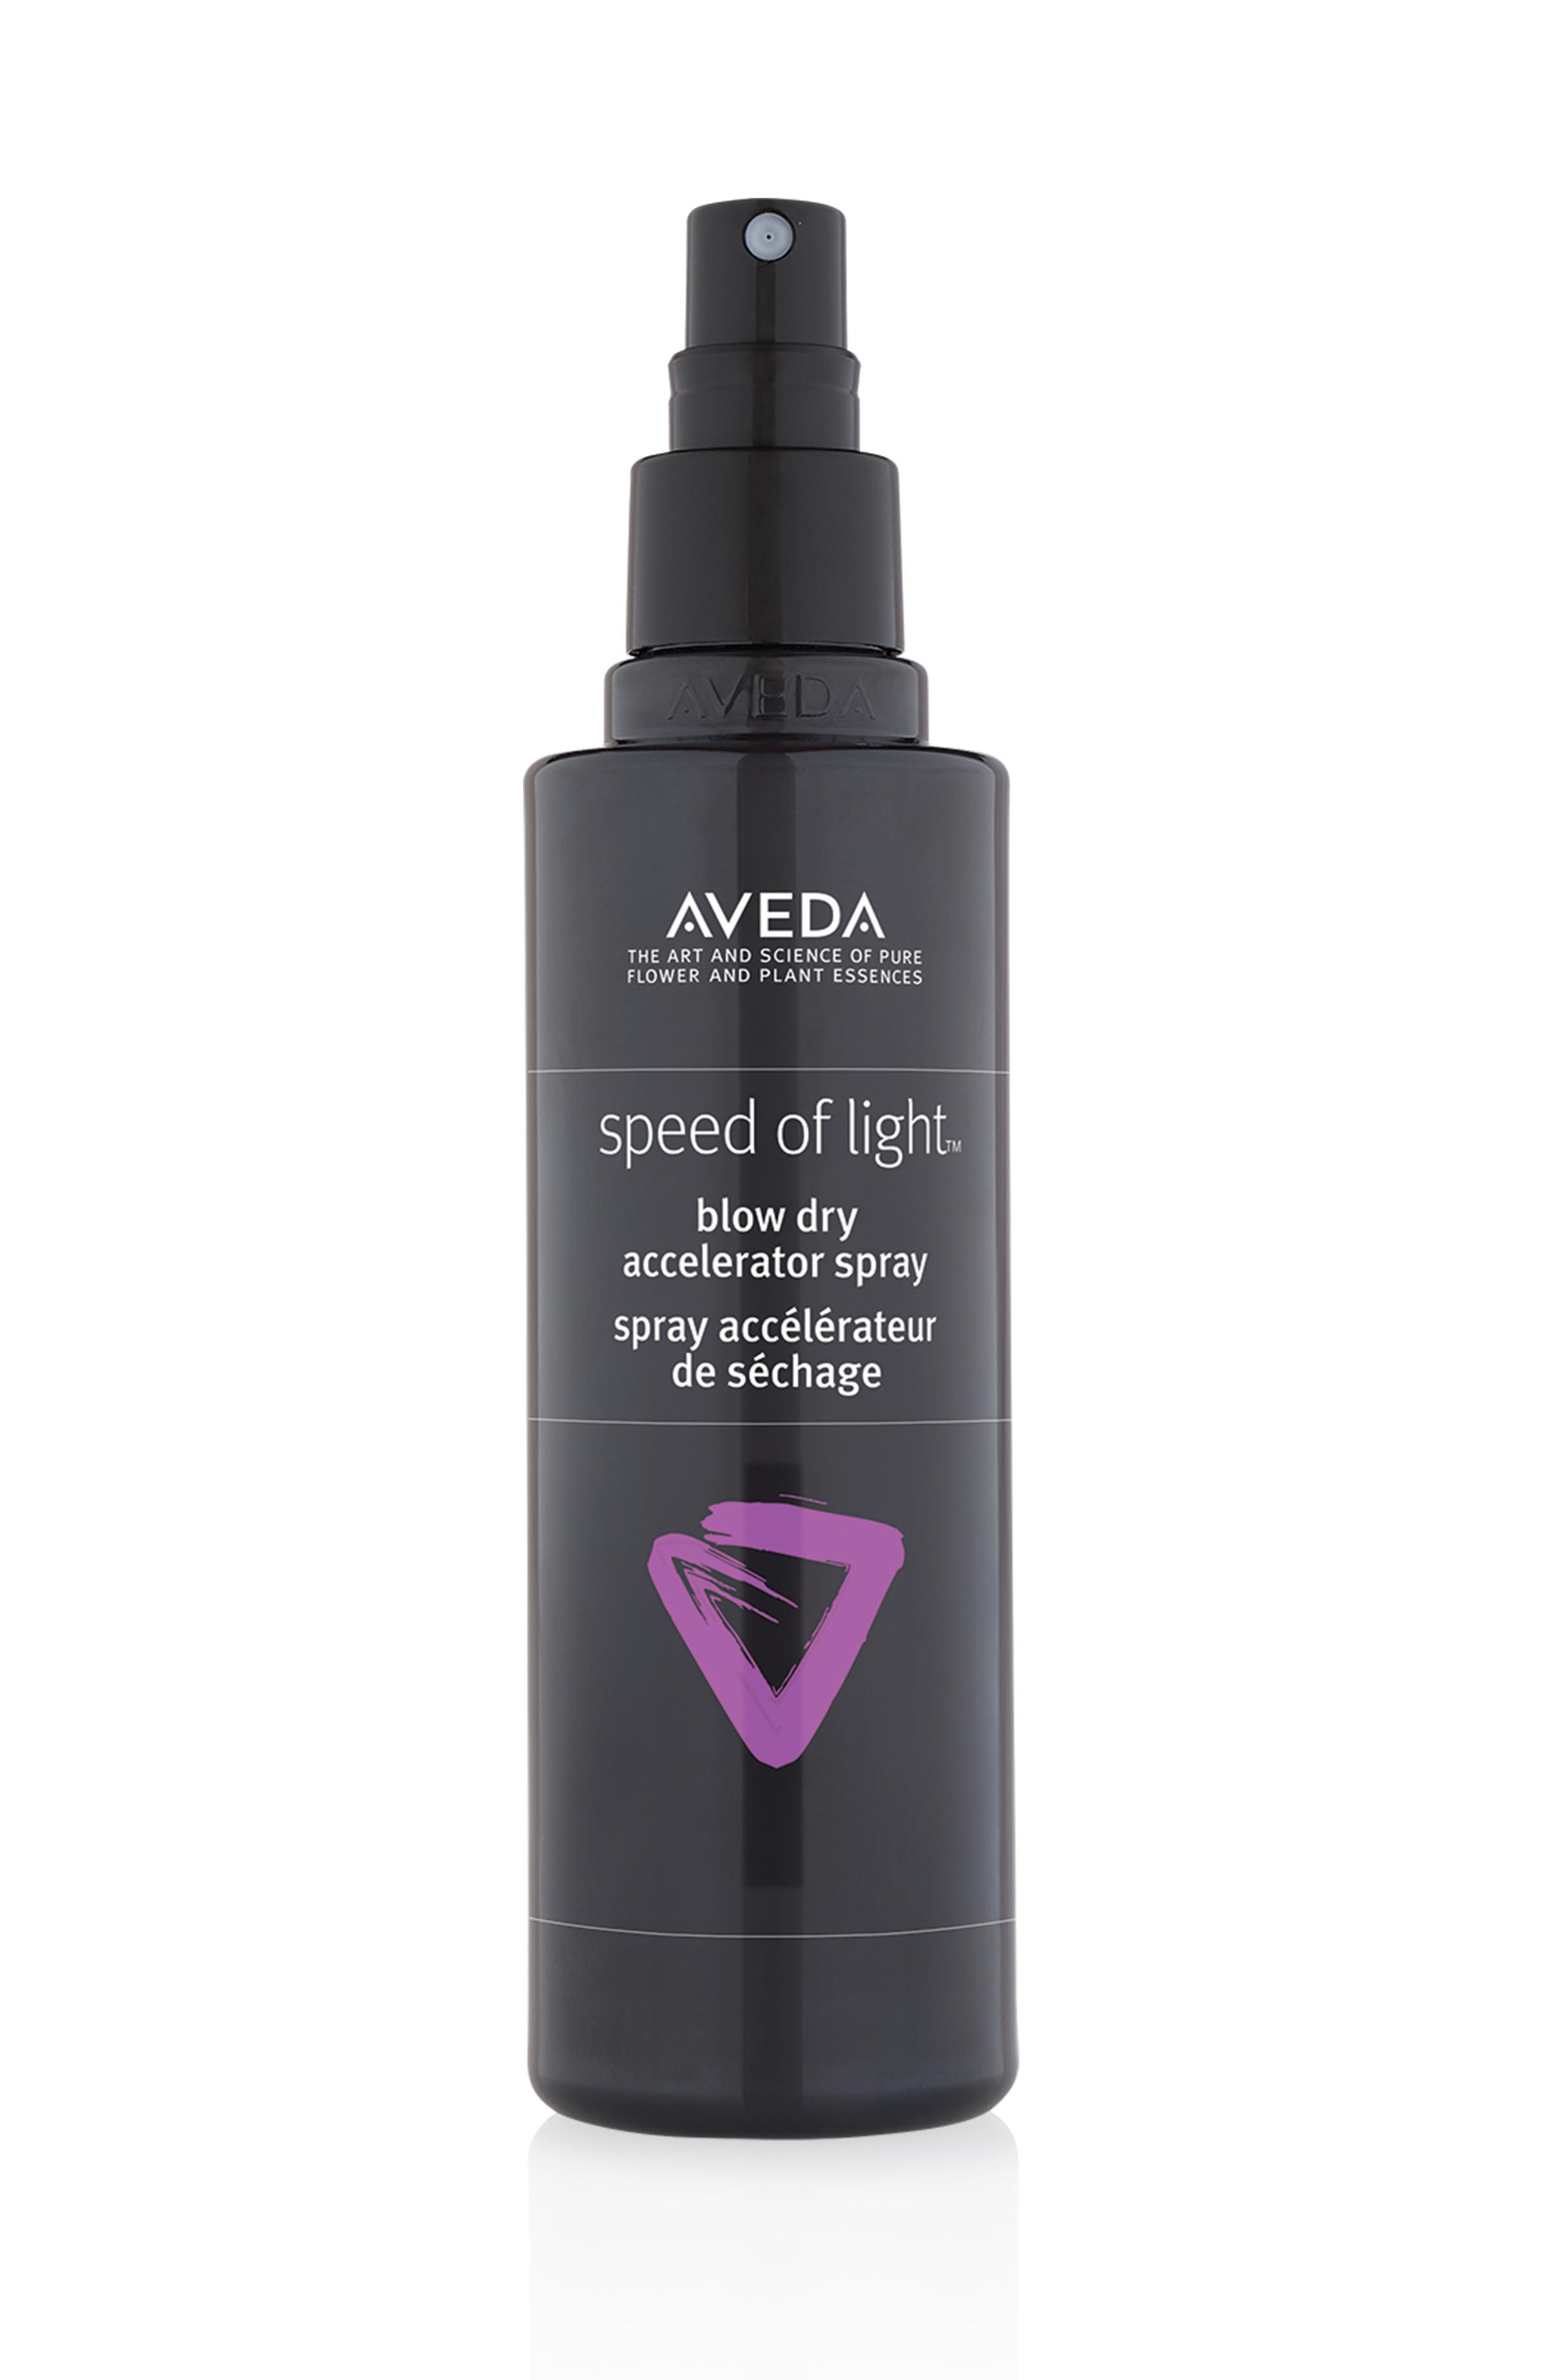 Aveda speed of light - spray pre-asciugatura 200 ml, Nero, large image number 0